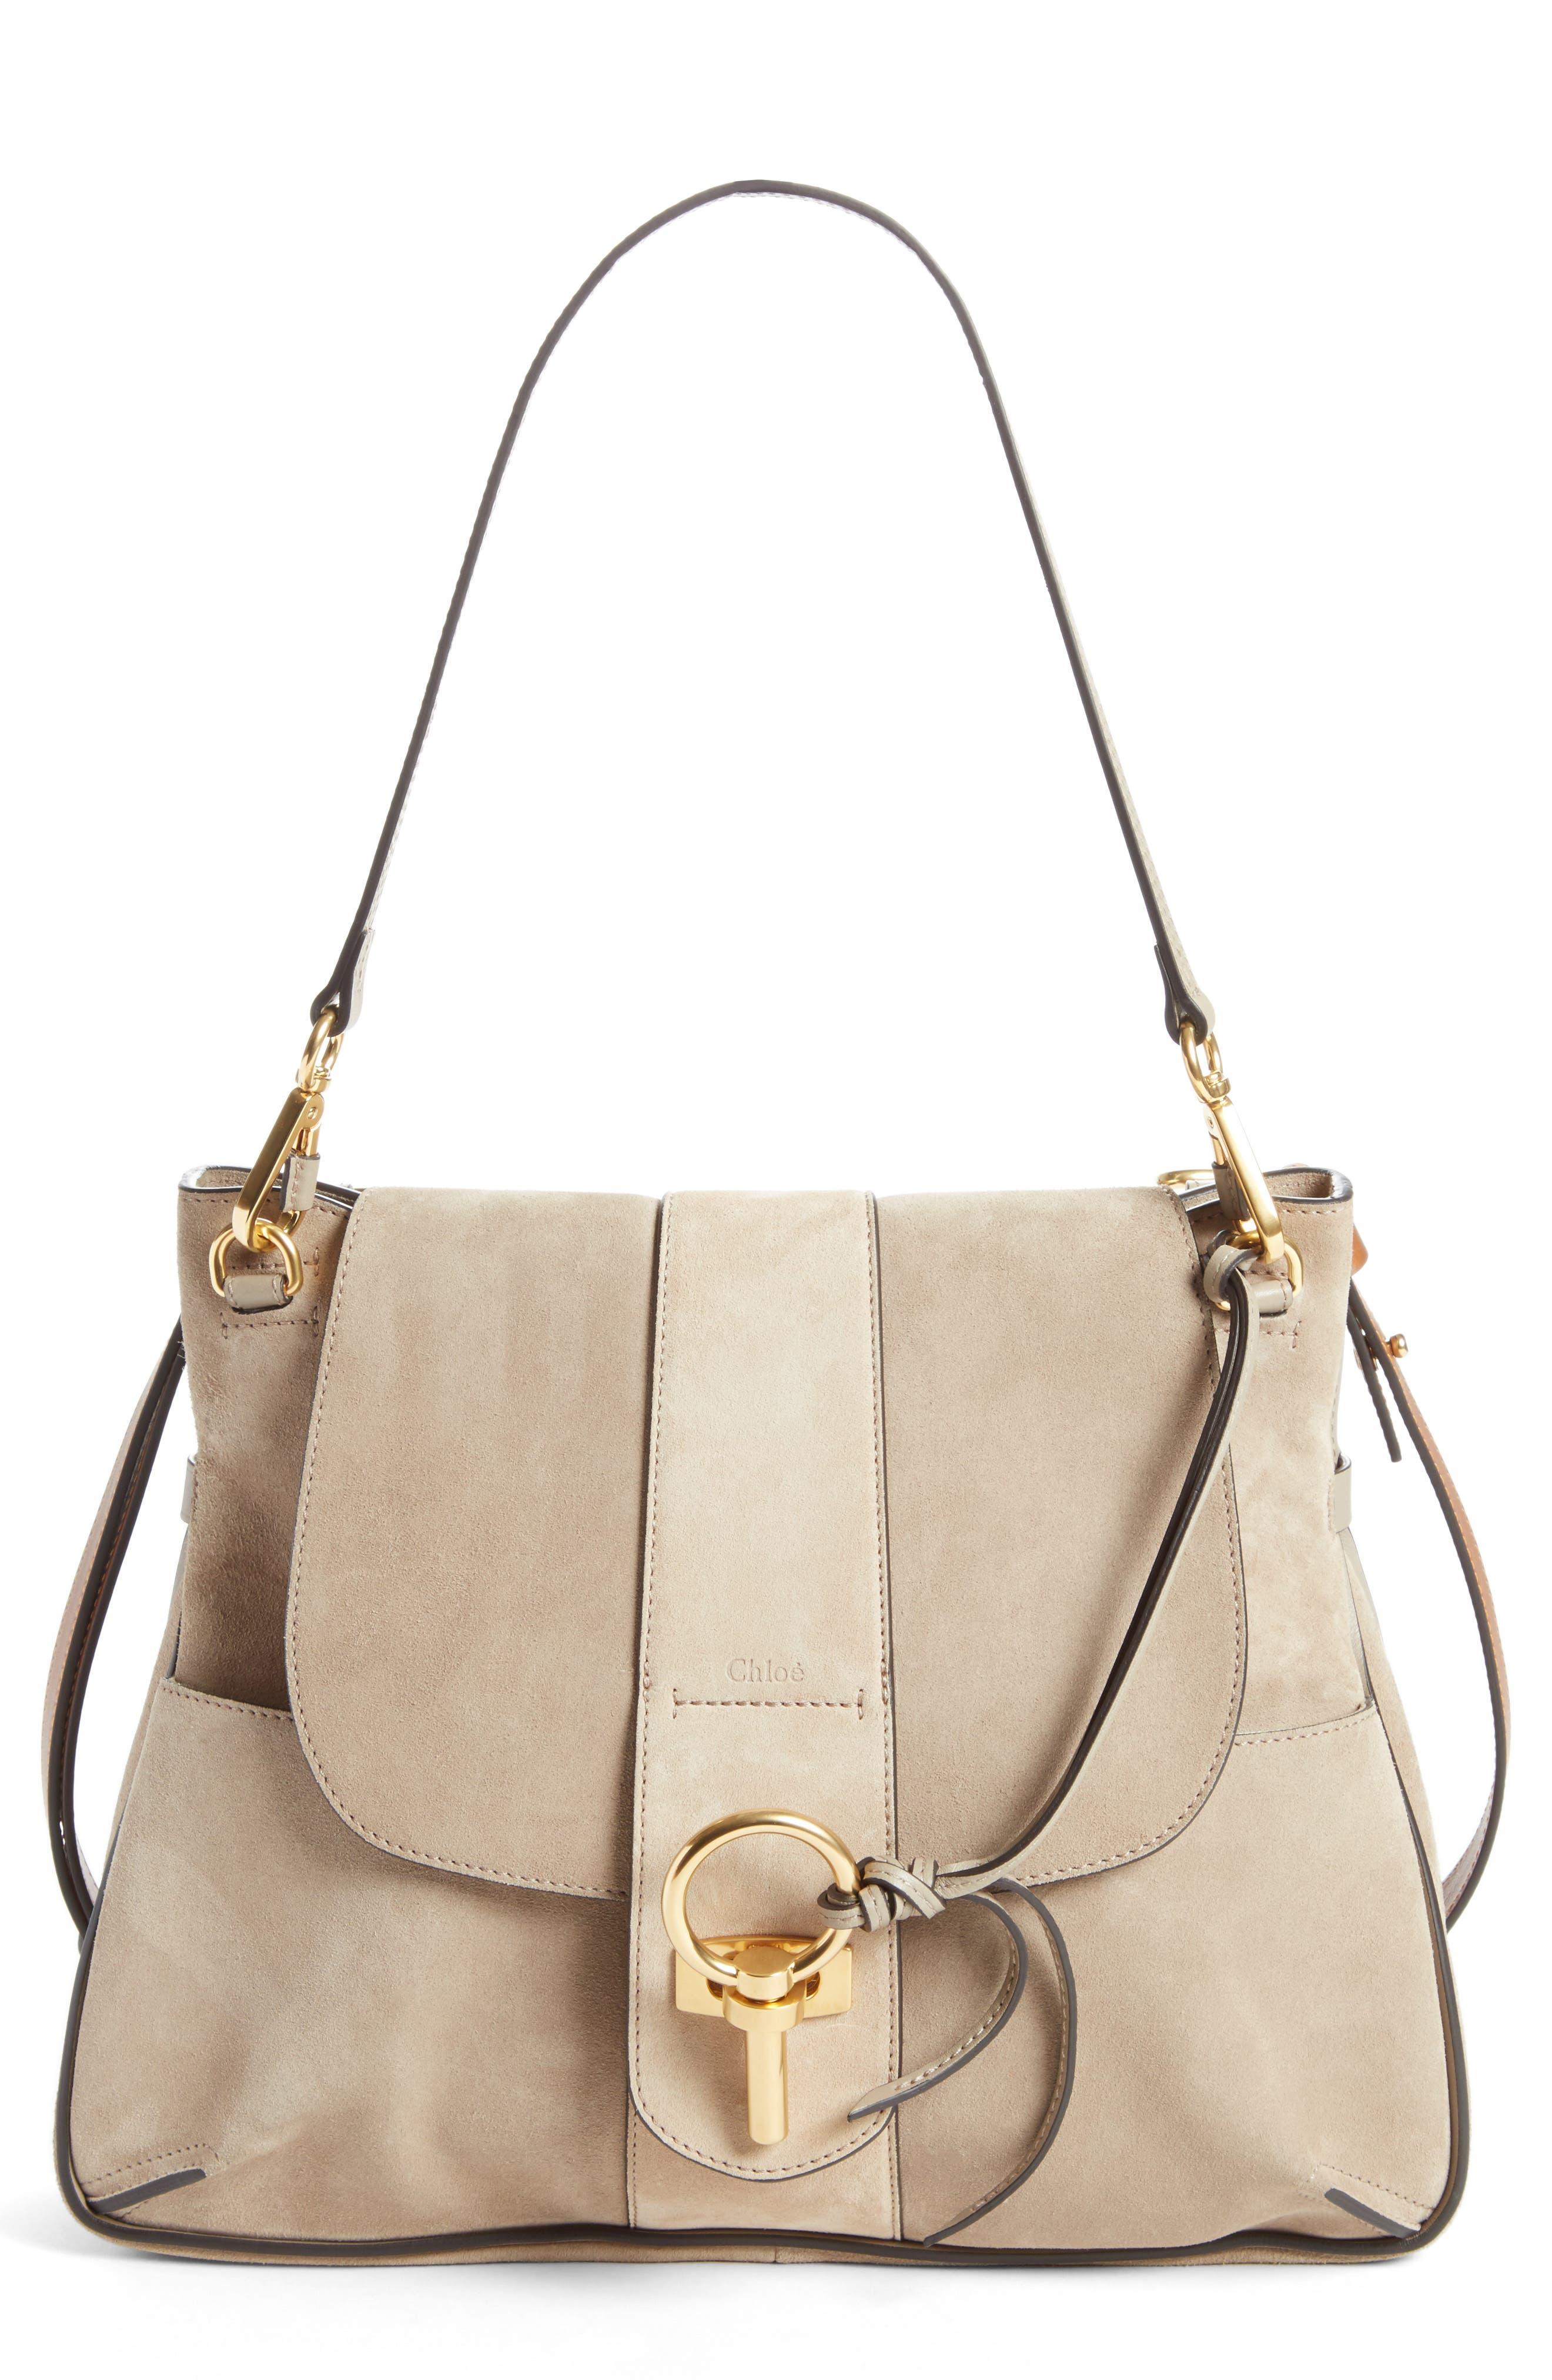 Medium Lexa Leather Shoulder Bag,                         Main,                         color, 031